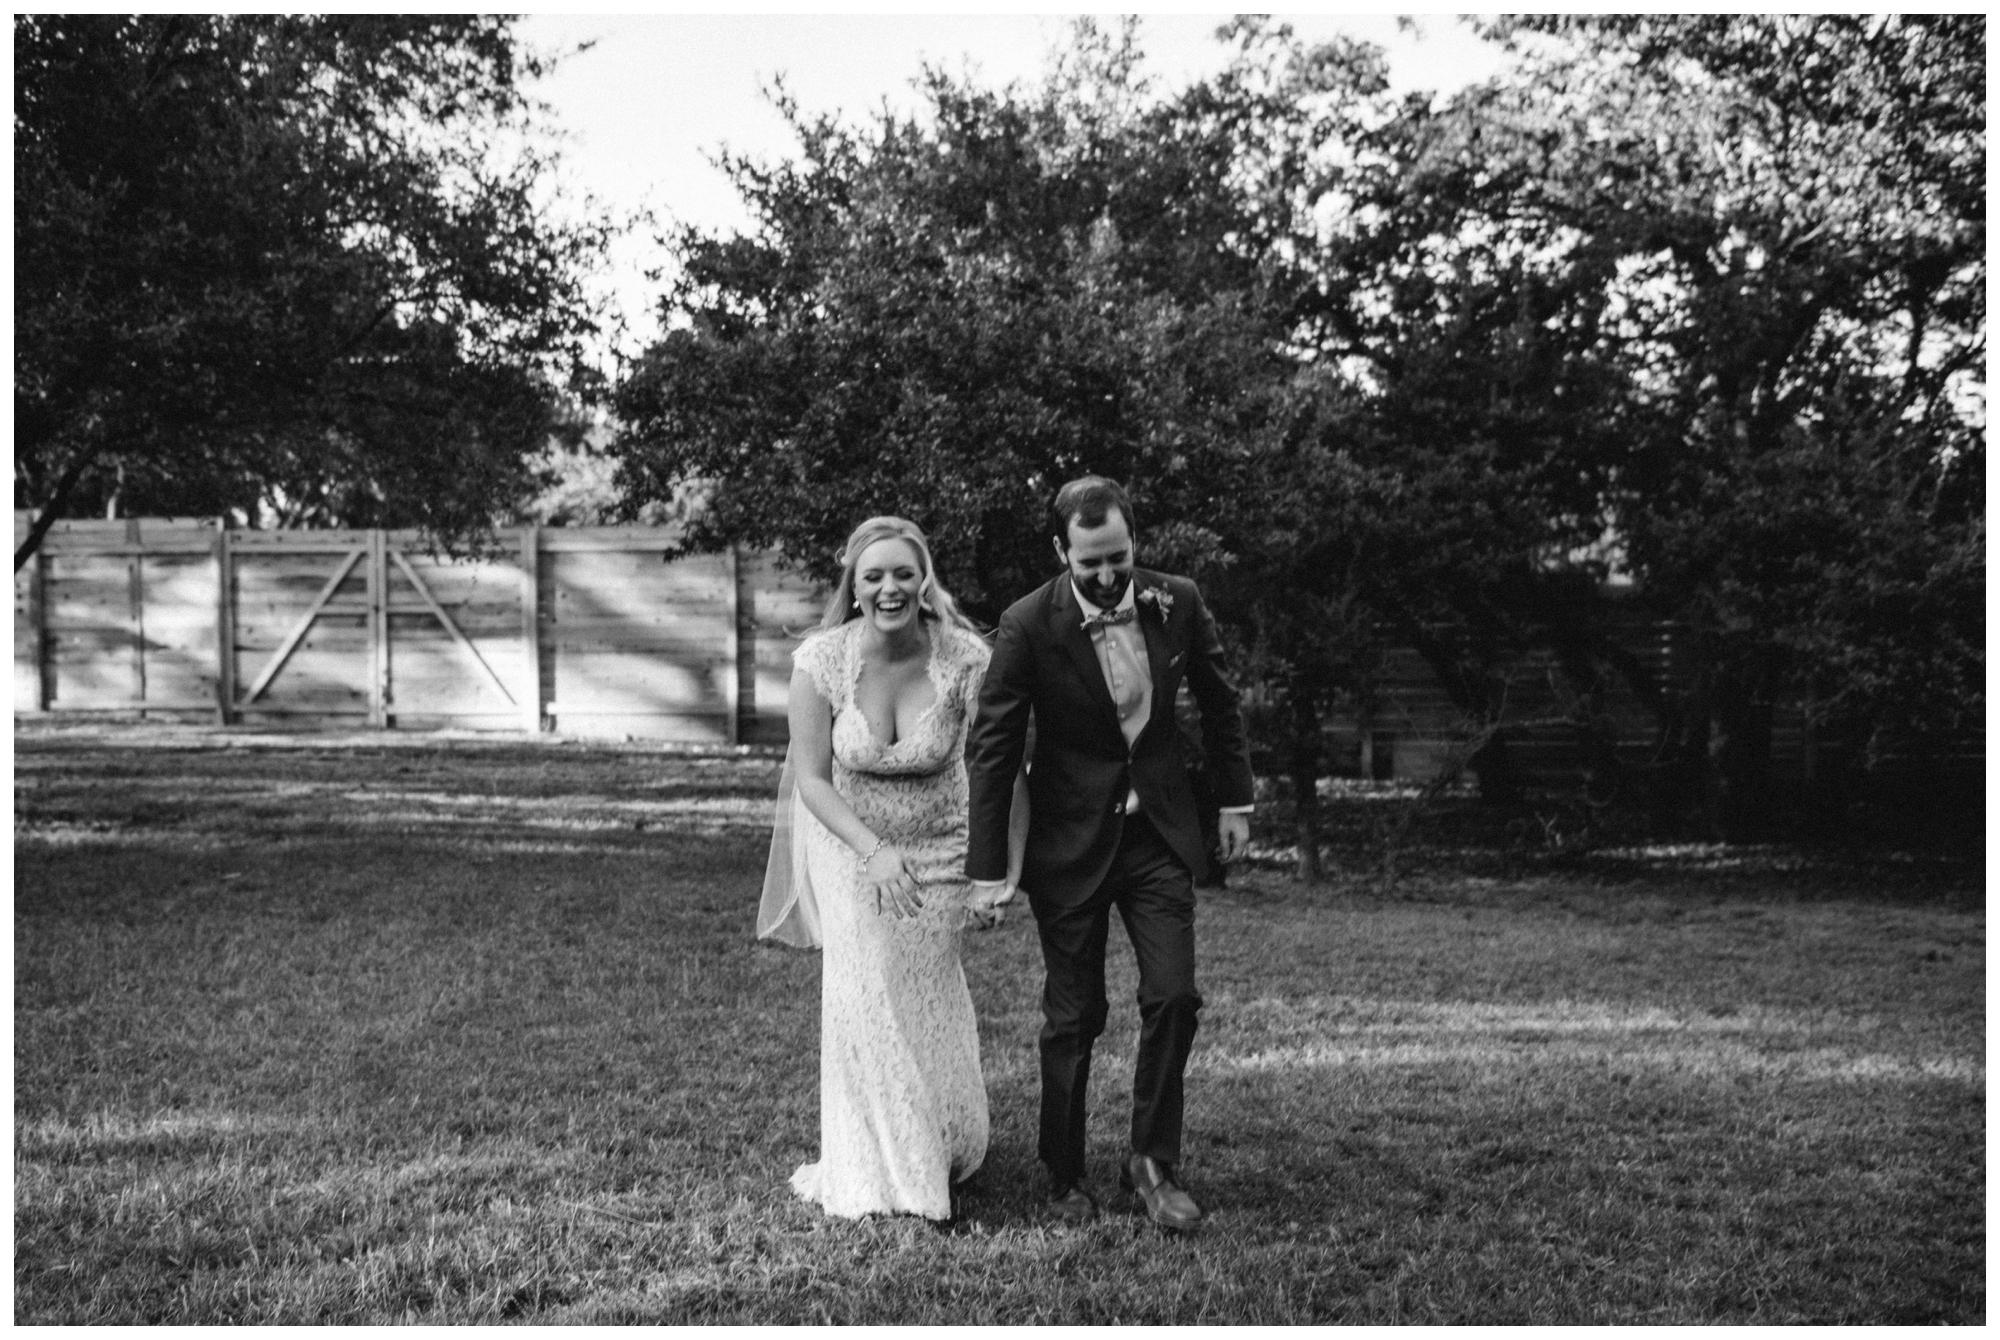 austin-texas-wedding-photography-1778-photographie_0065.jpg